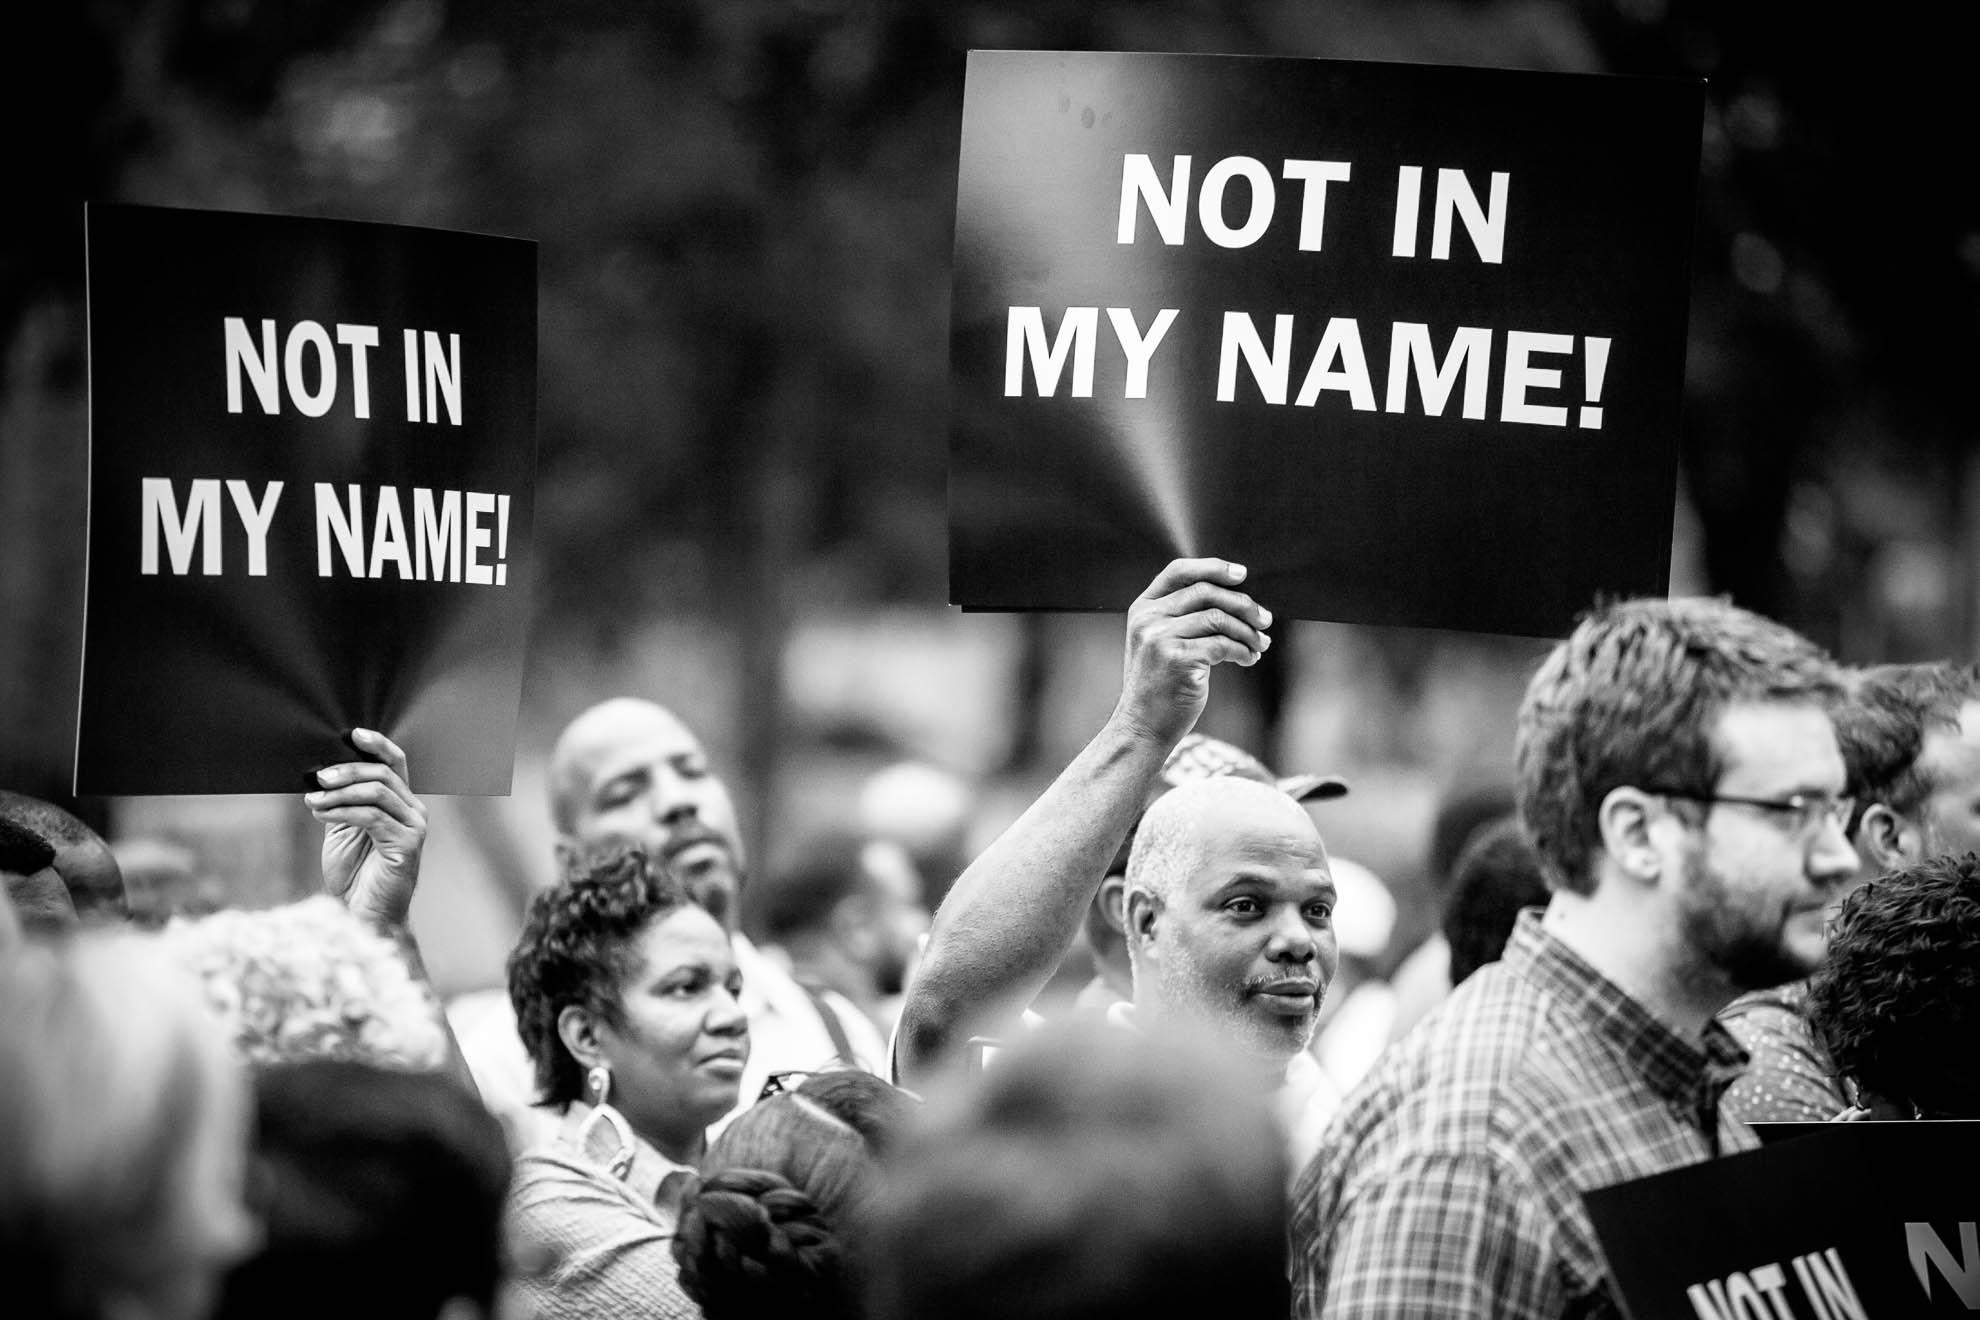 death penalty, photography, photos, execution, prison, documentary, troy davis, innocent, georgia, protest, vigil